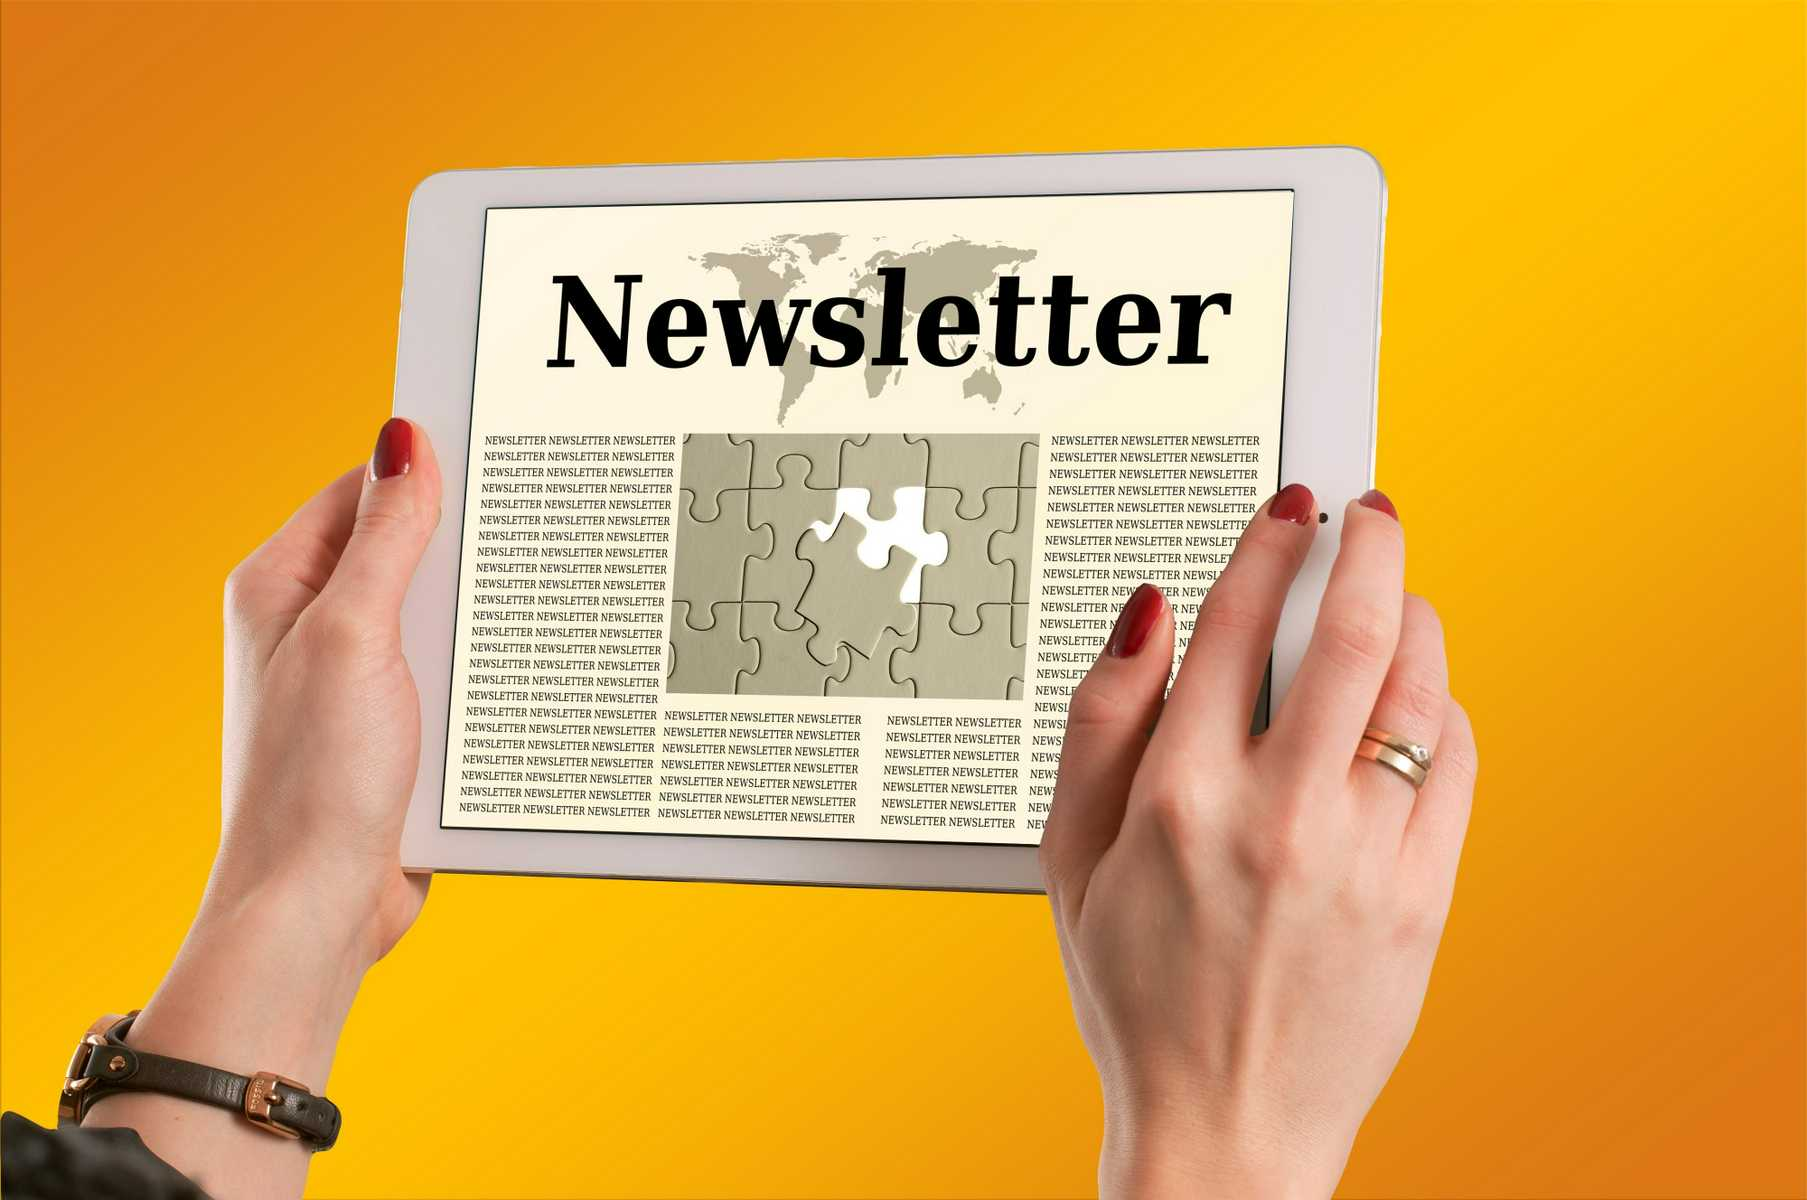 Church Newsletter on a Tablet - Ideas Blog